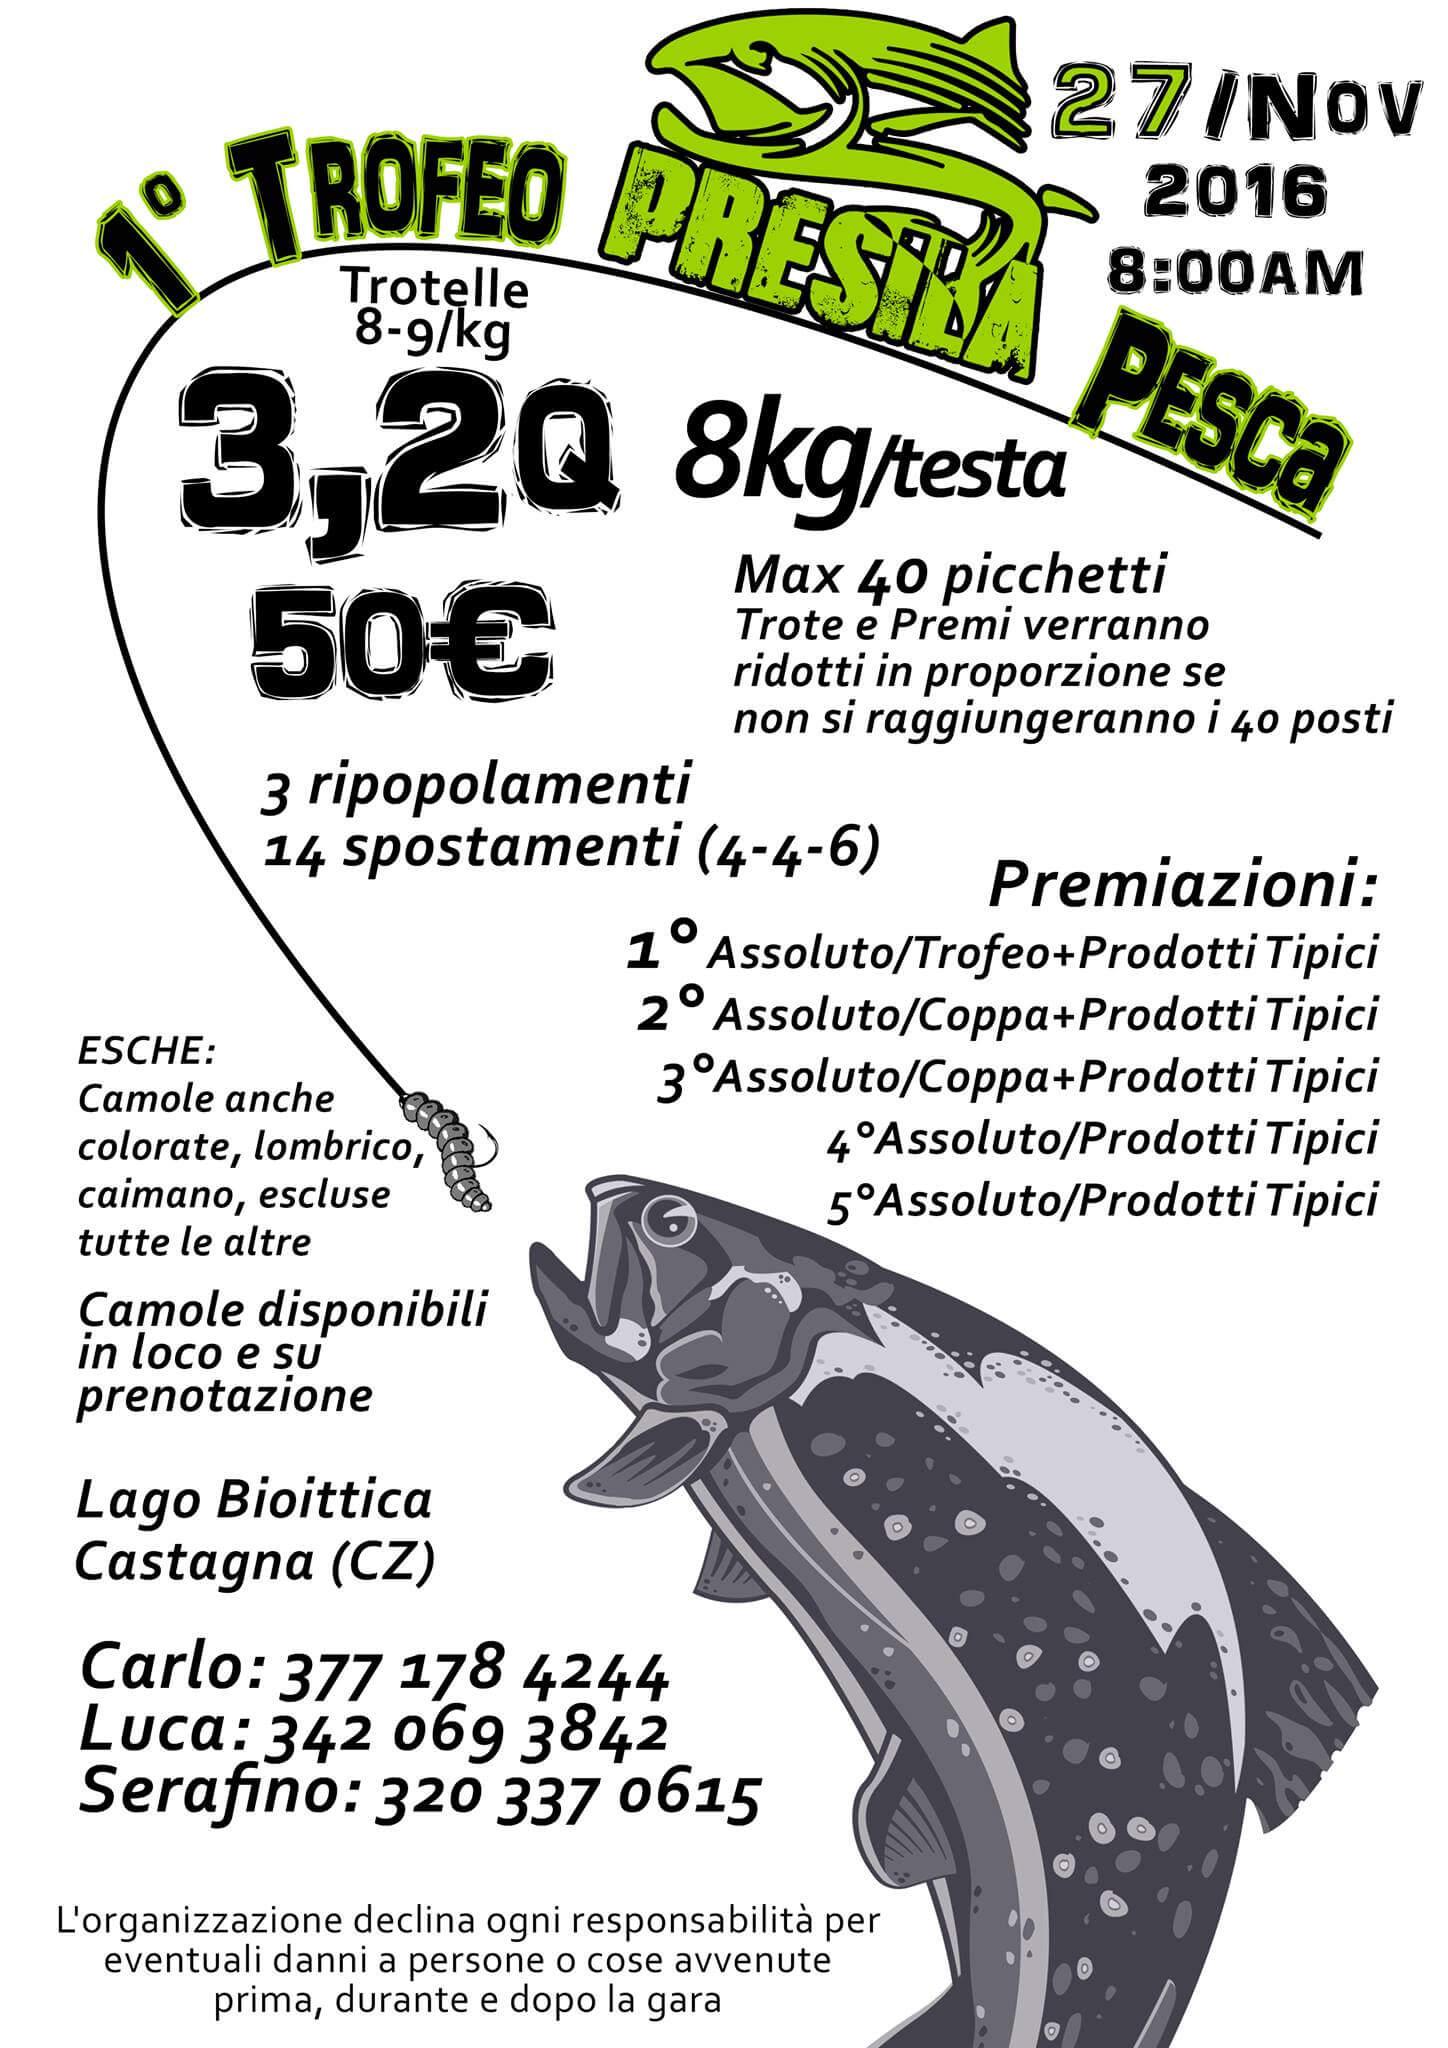 trofeo-presila-pesca-poster